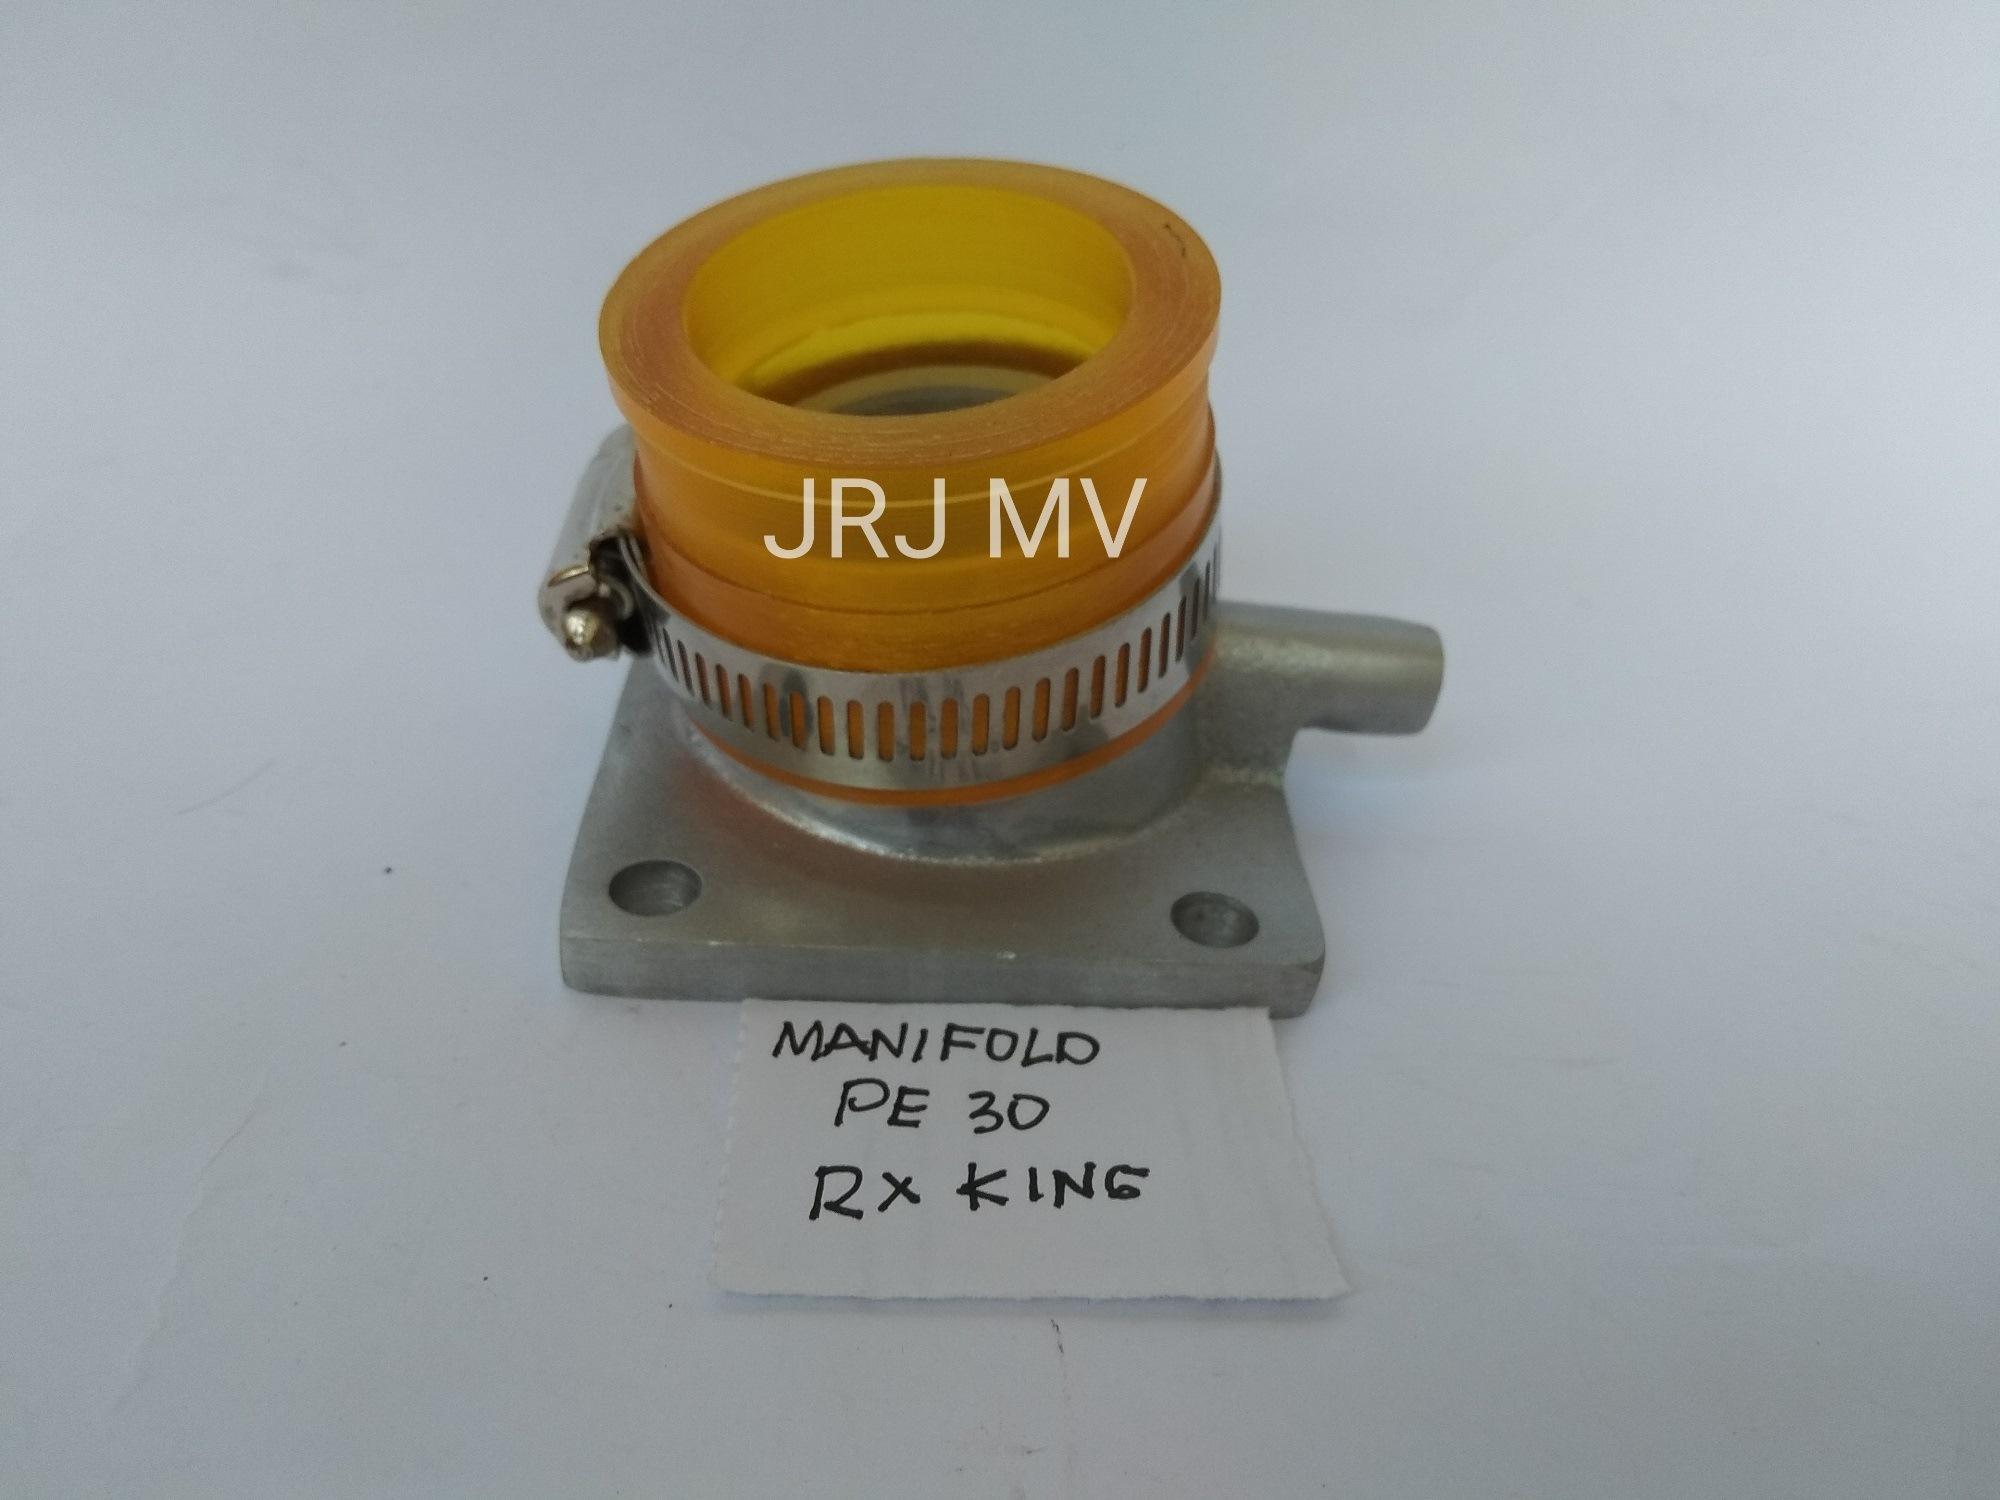 Buy Sell Cheapest Manifold Karburator Pe Best Quality Product Manipul Manifol Intek Intake Insulator Rx King Manipol 30